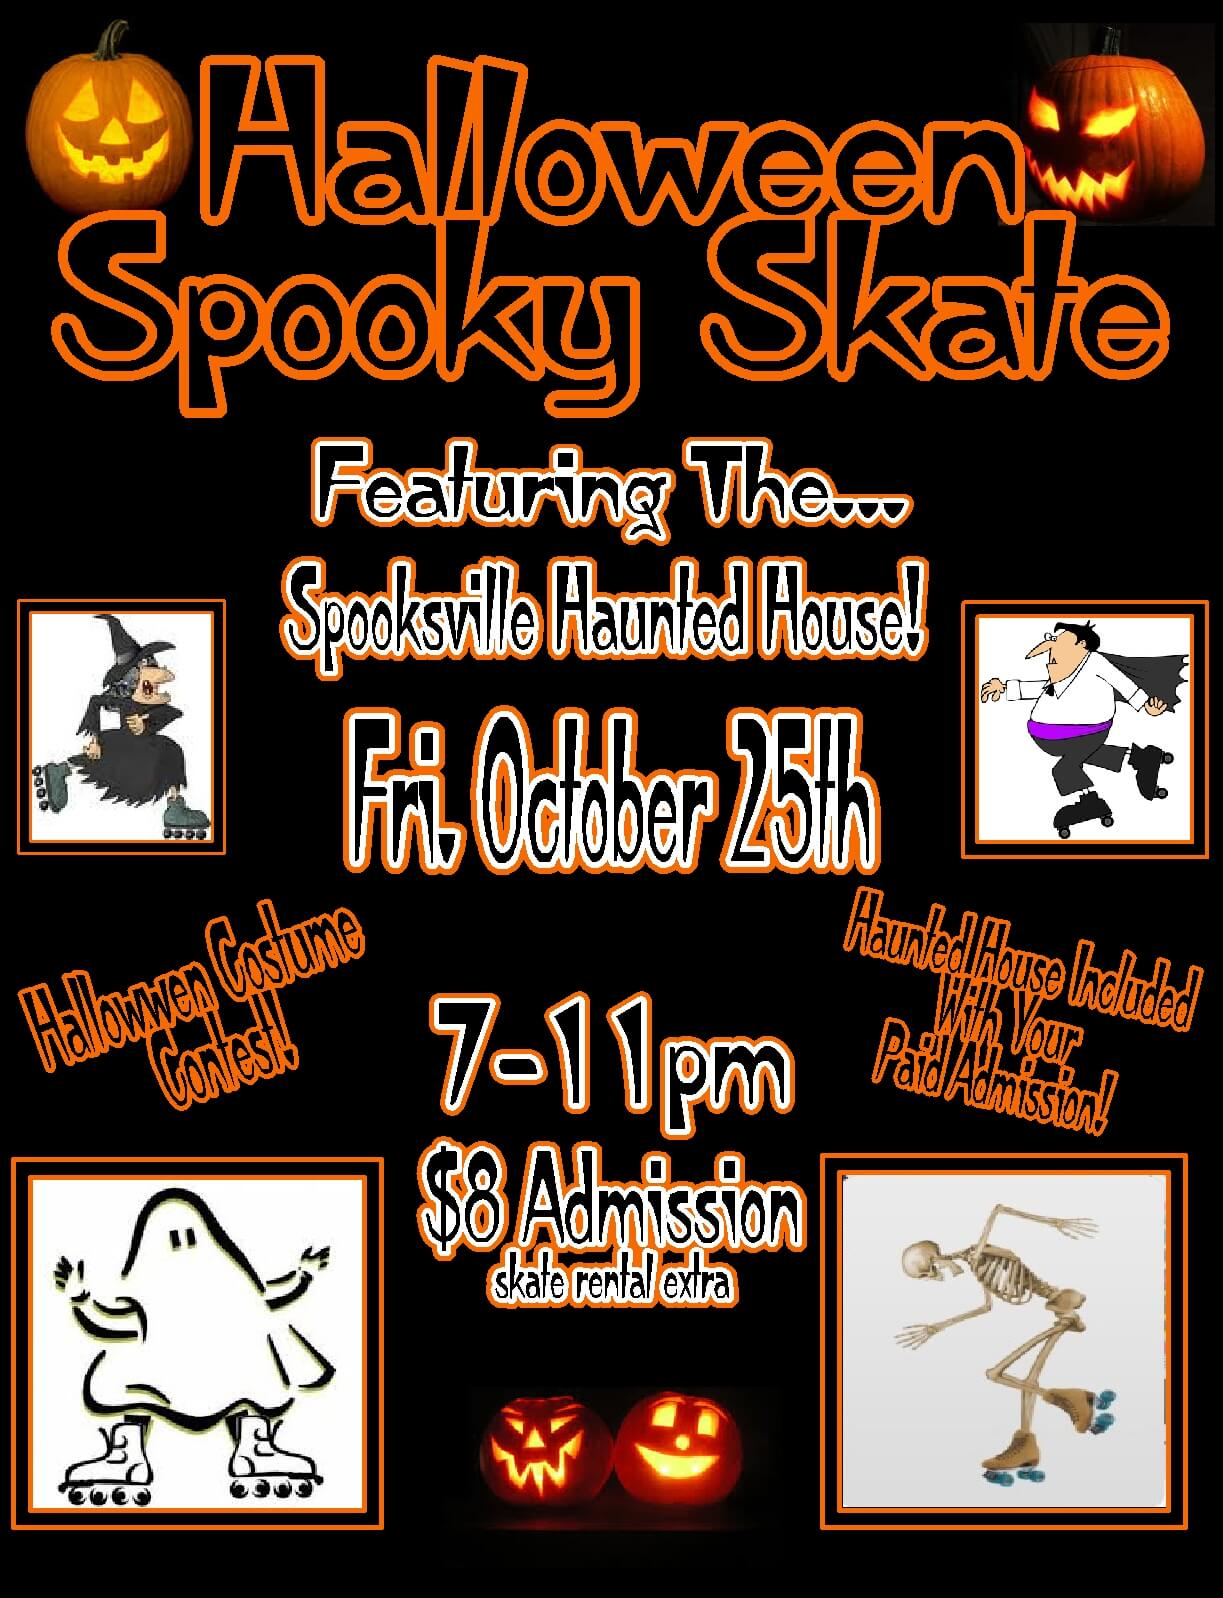 Halloween skate 2013